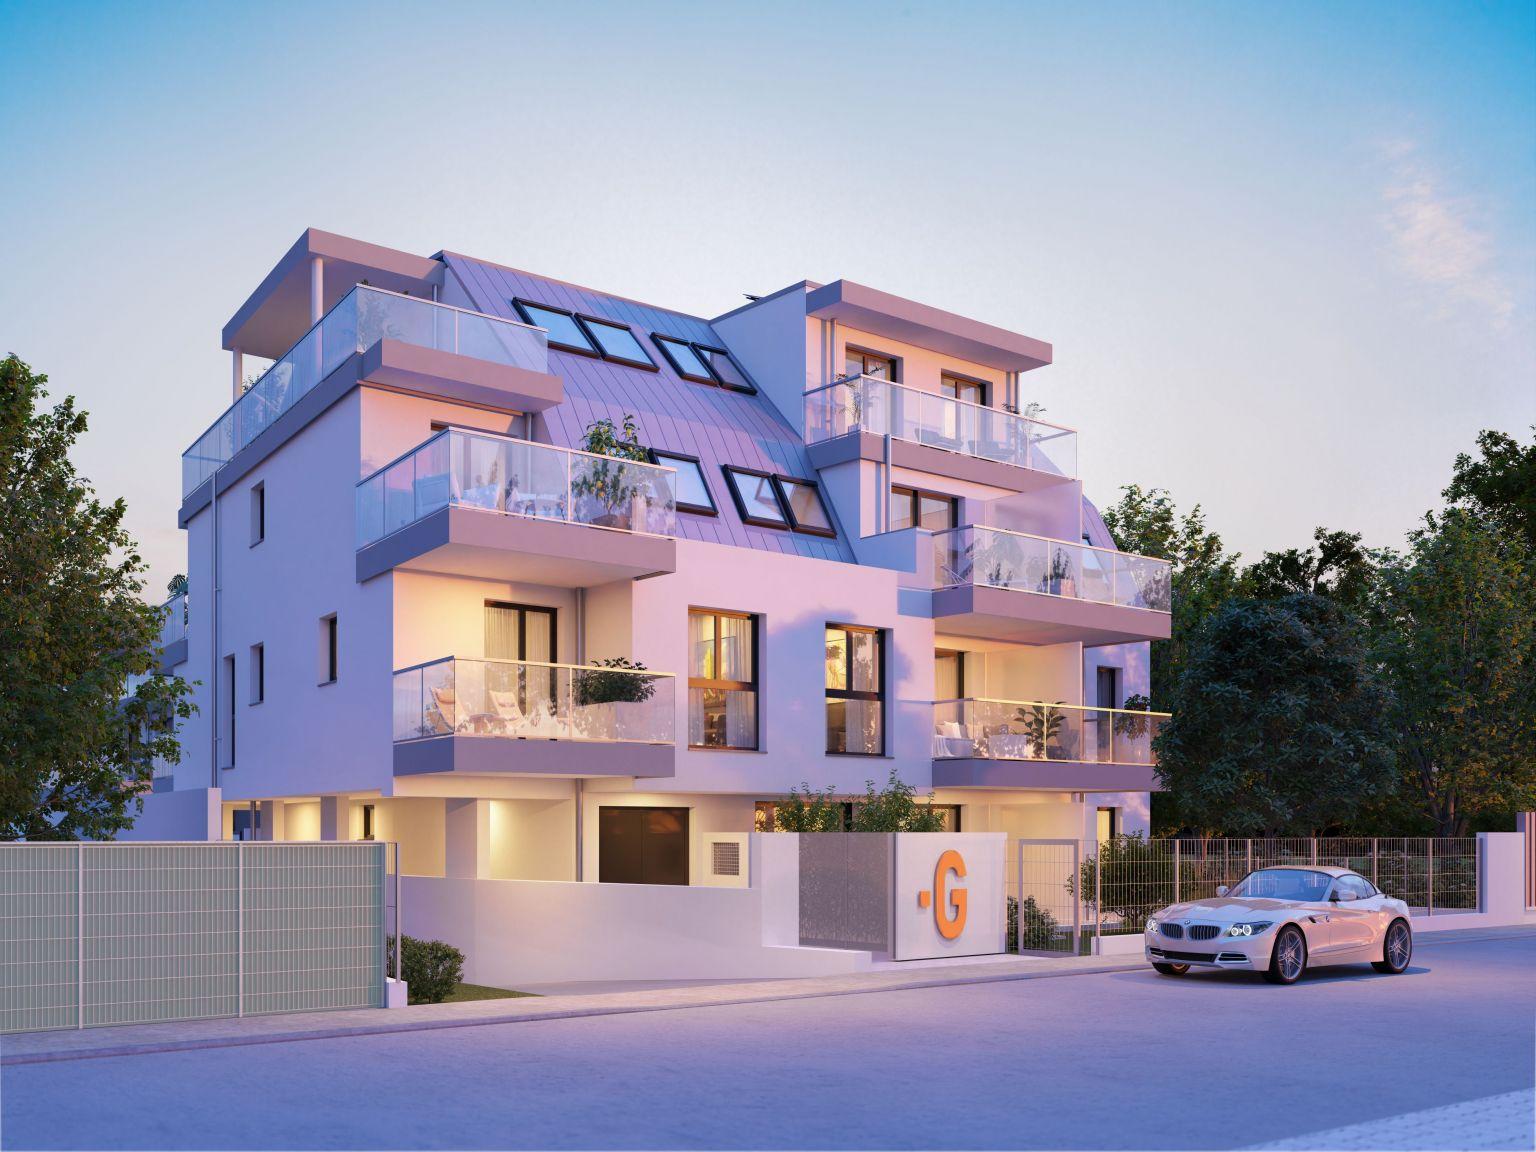 Glorit-Wohnprojekt in Aspern feiert Dachgleiche